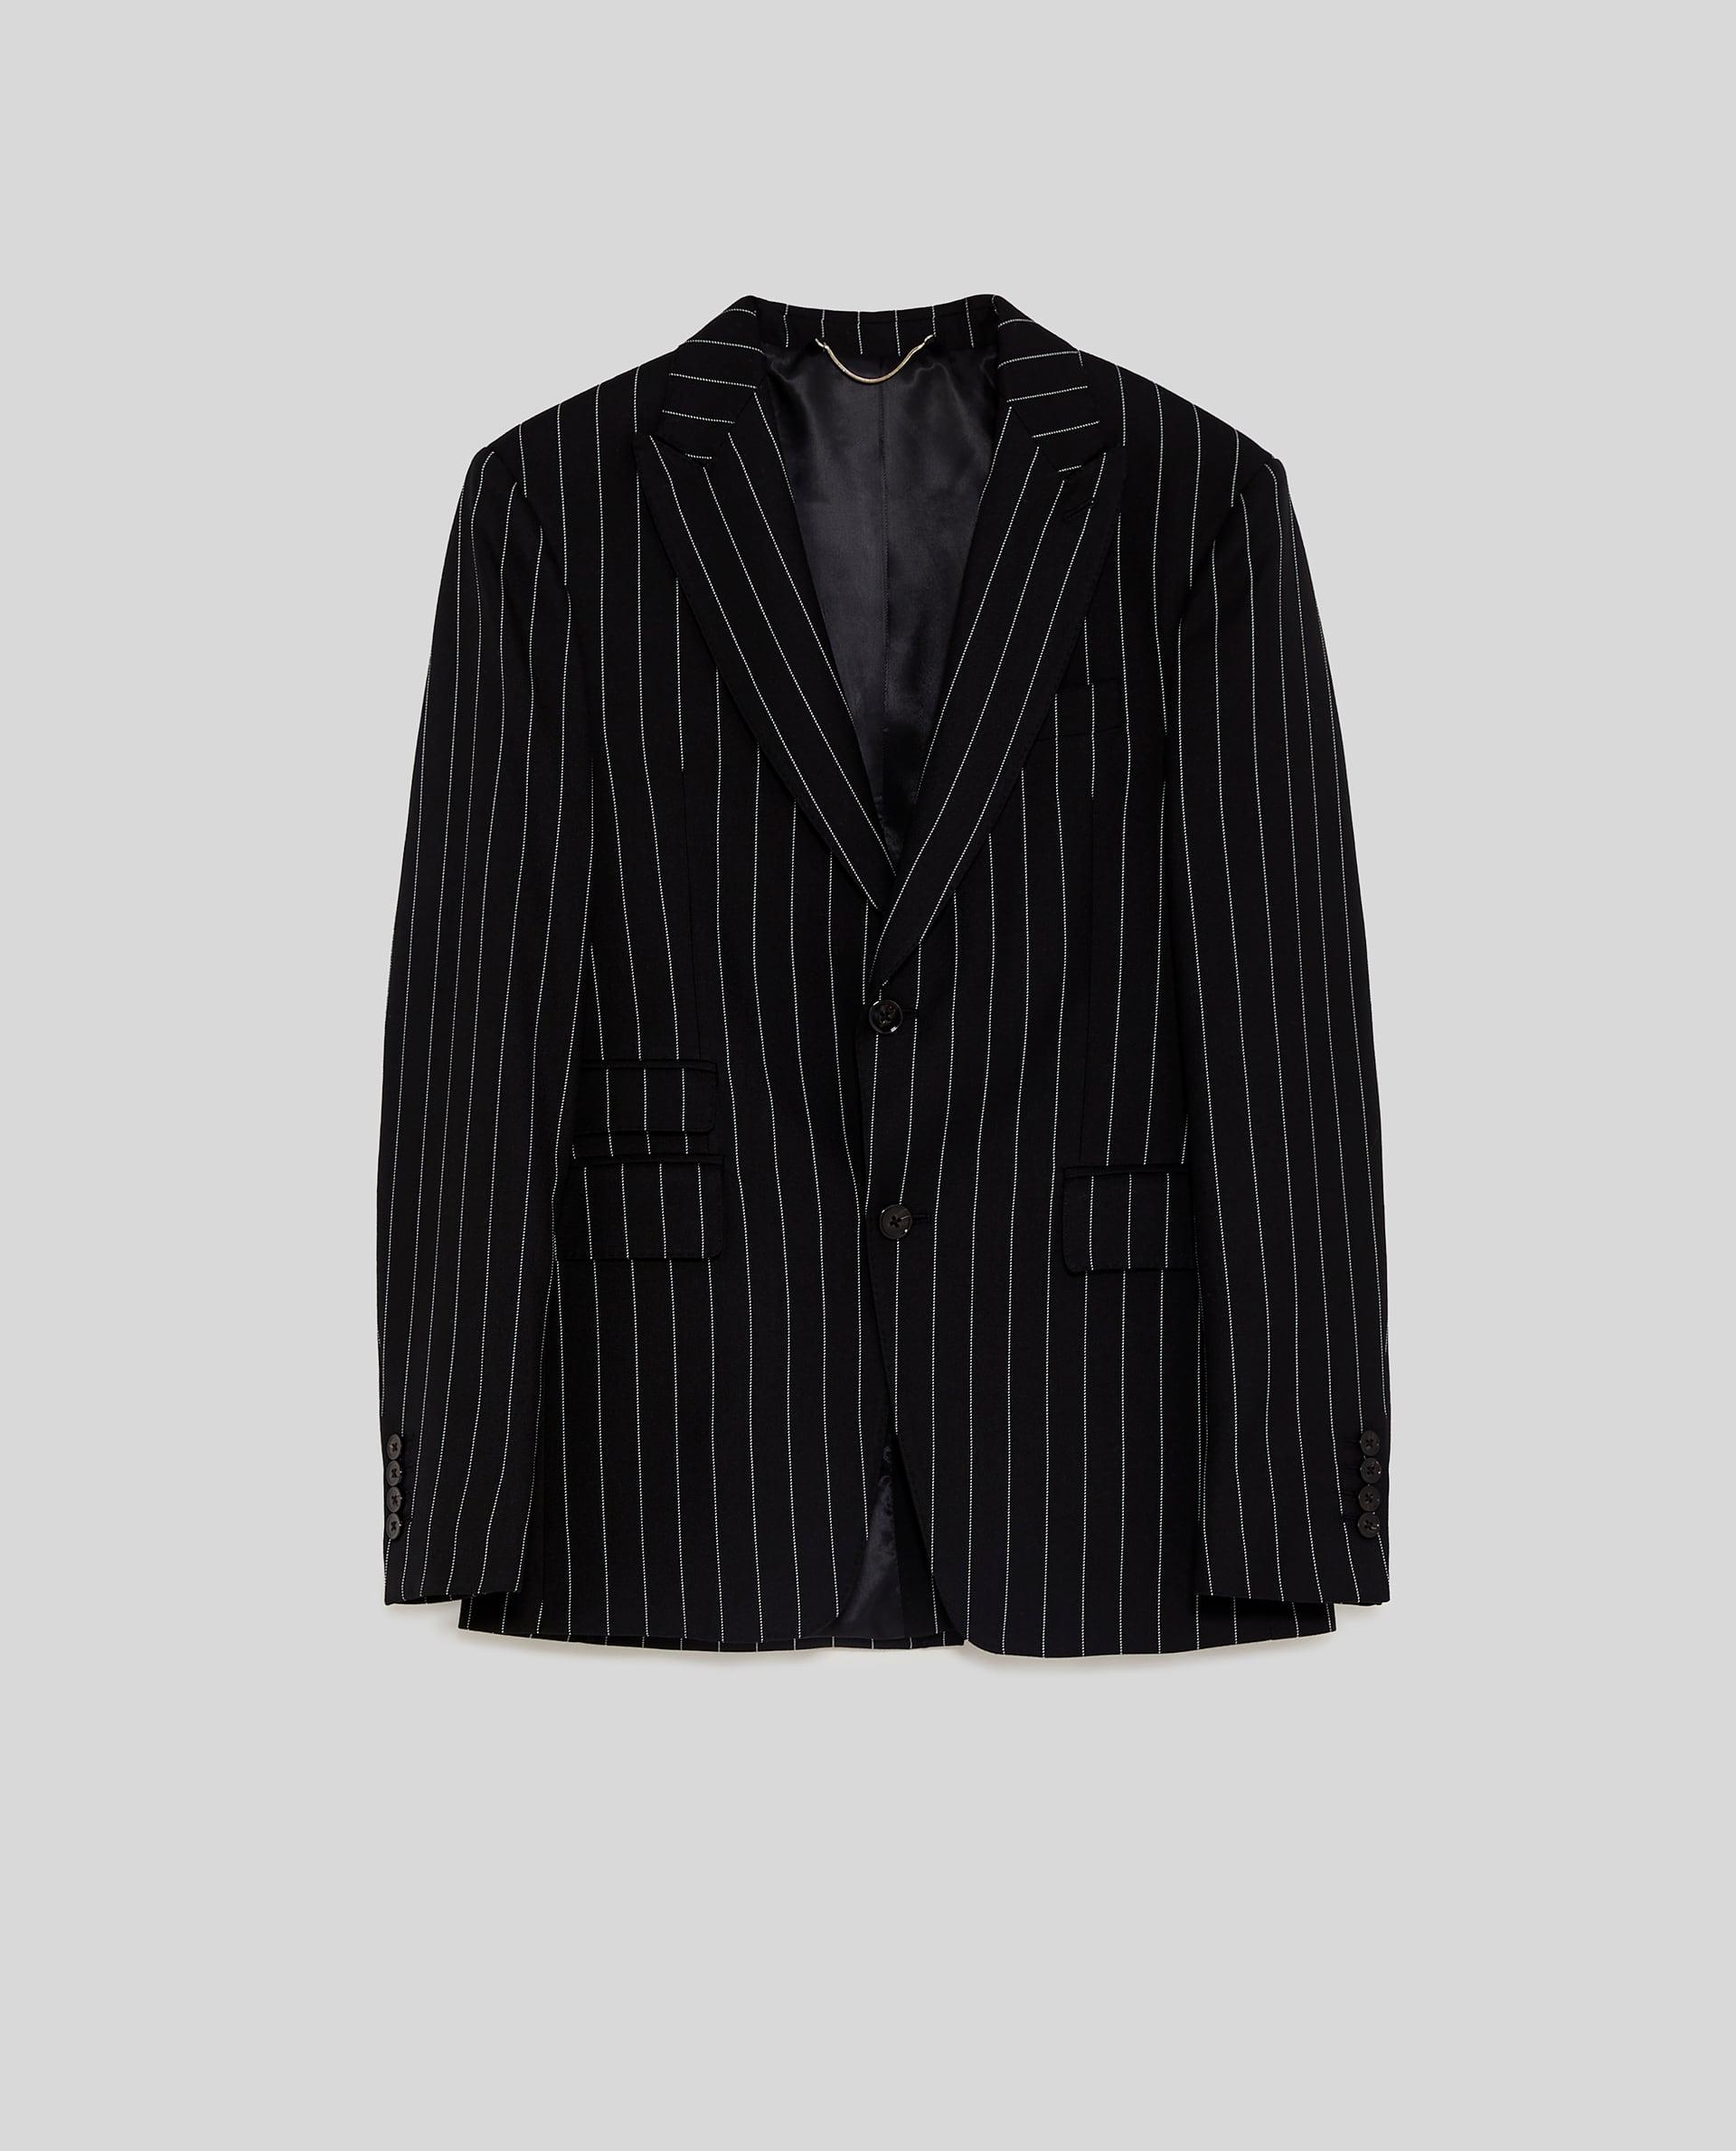 https://www.zara.com/ca/en/pinstriped-suit-blazer-p01815400.html?v1=5562026&v2=583022